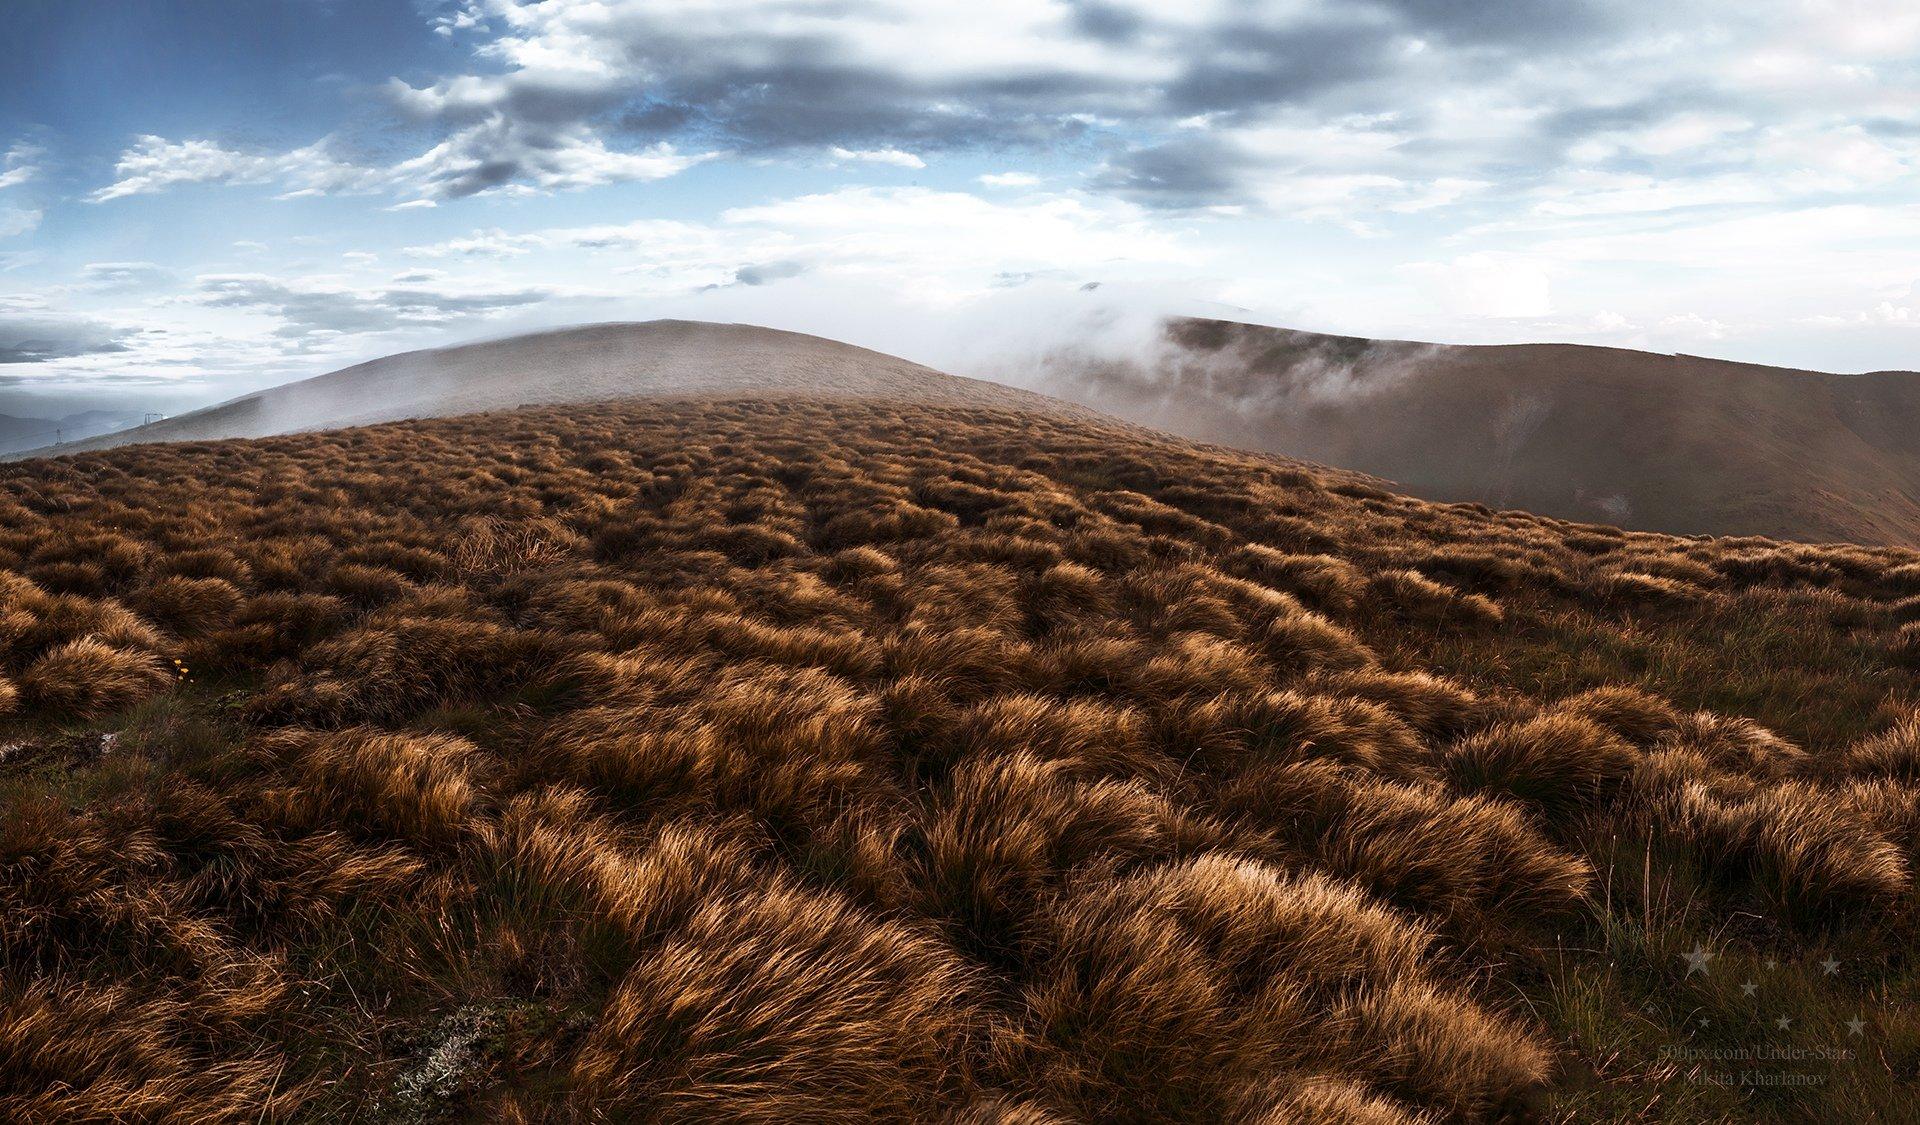 трава, драгобрат, карпаты, горы, склоны, Харланов Никита